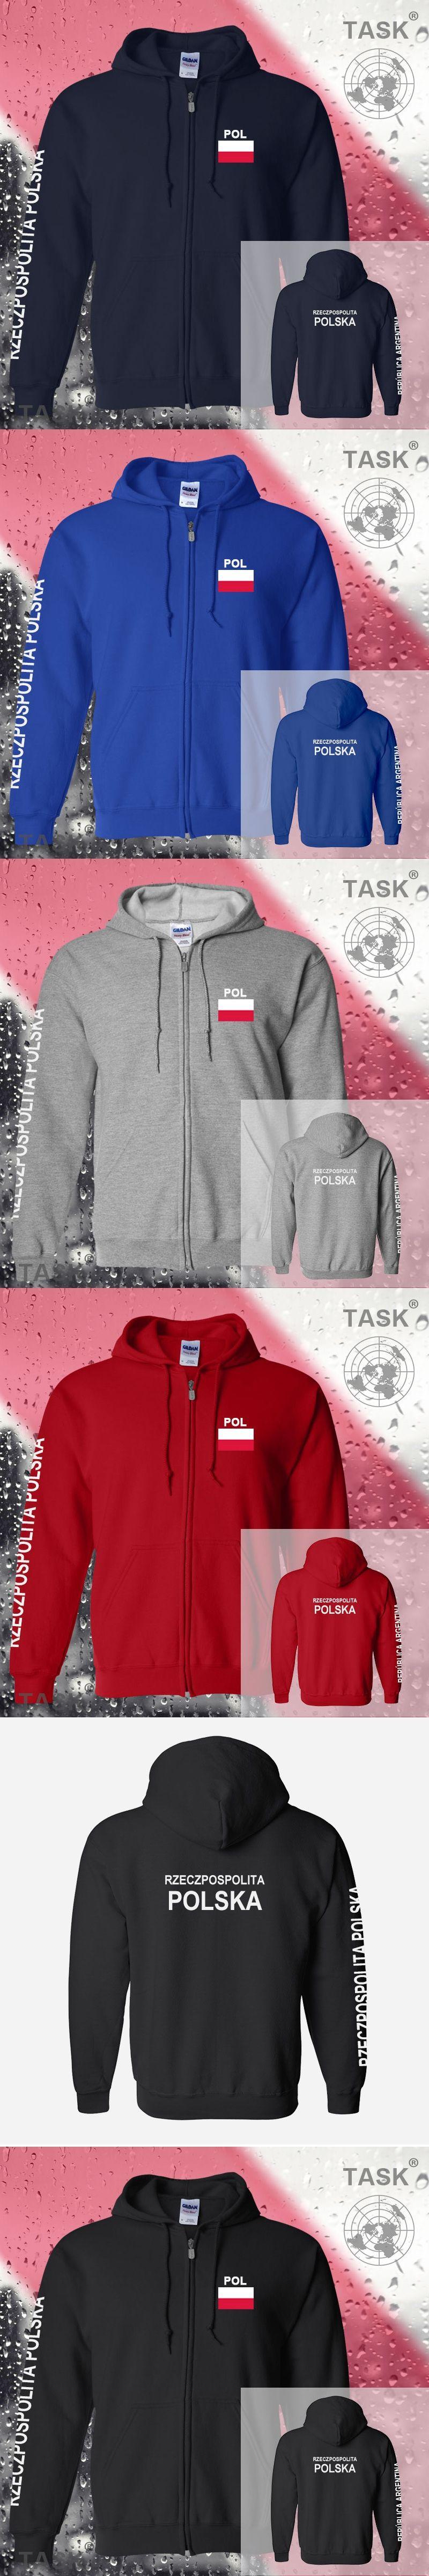 f6451defe4d Poland Polska POL Polish mens hoodies and sweatshirt jerseys polo sweat new  streetwear tracksuit nations fleece